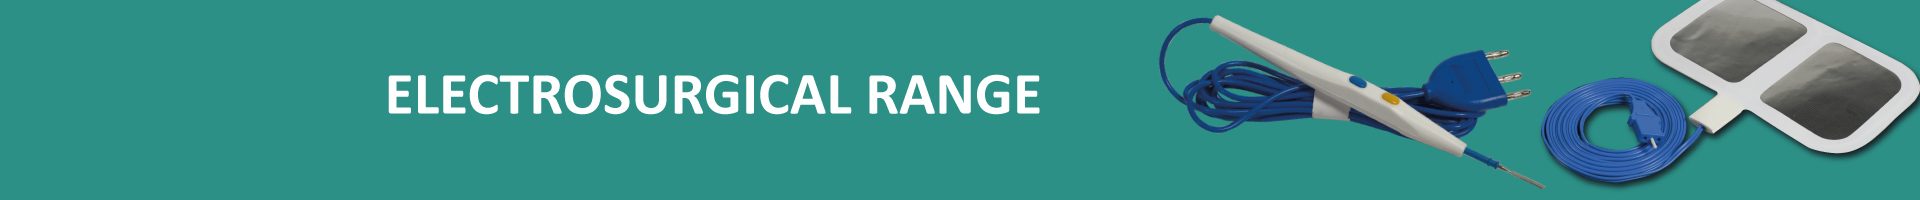 Electrosurgical Range